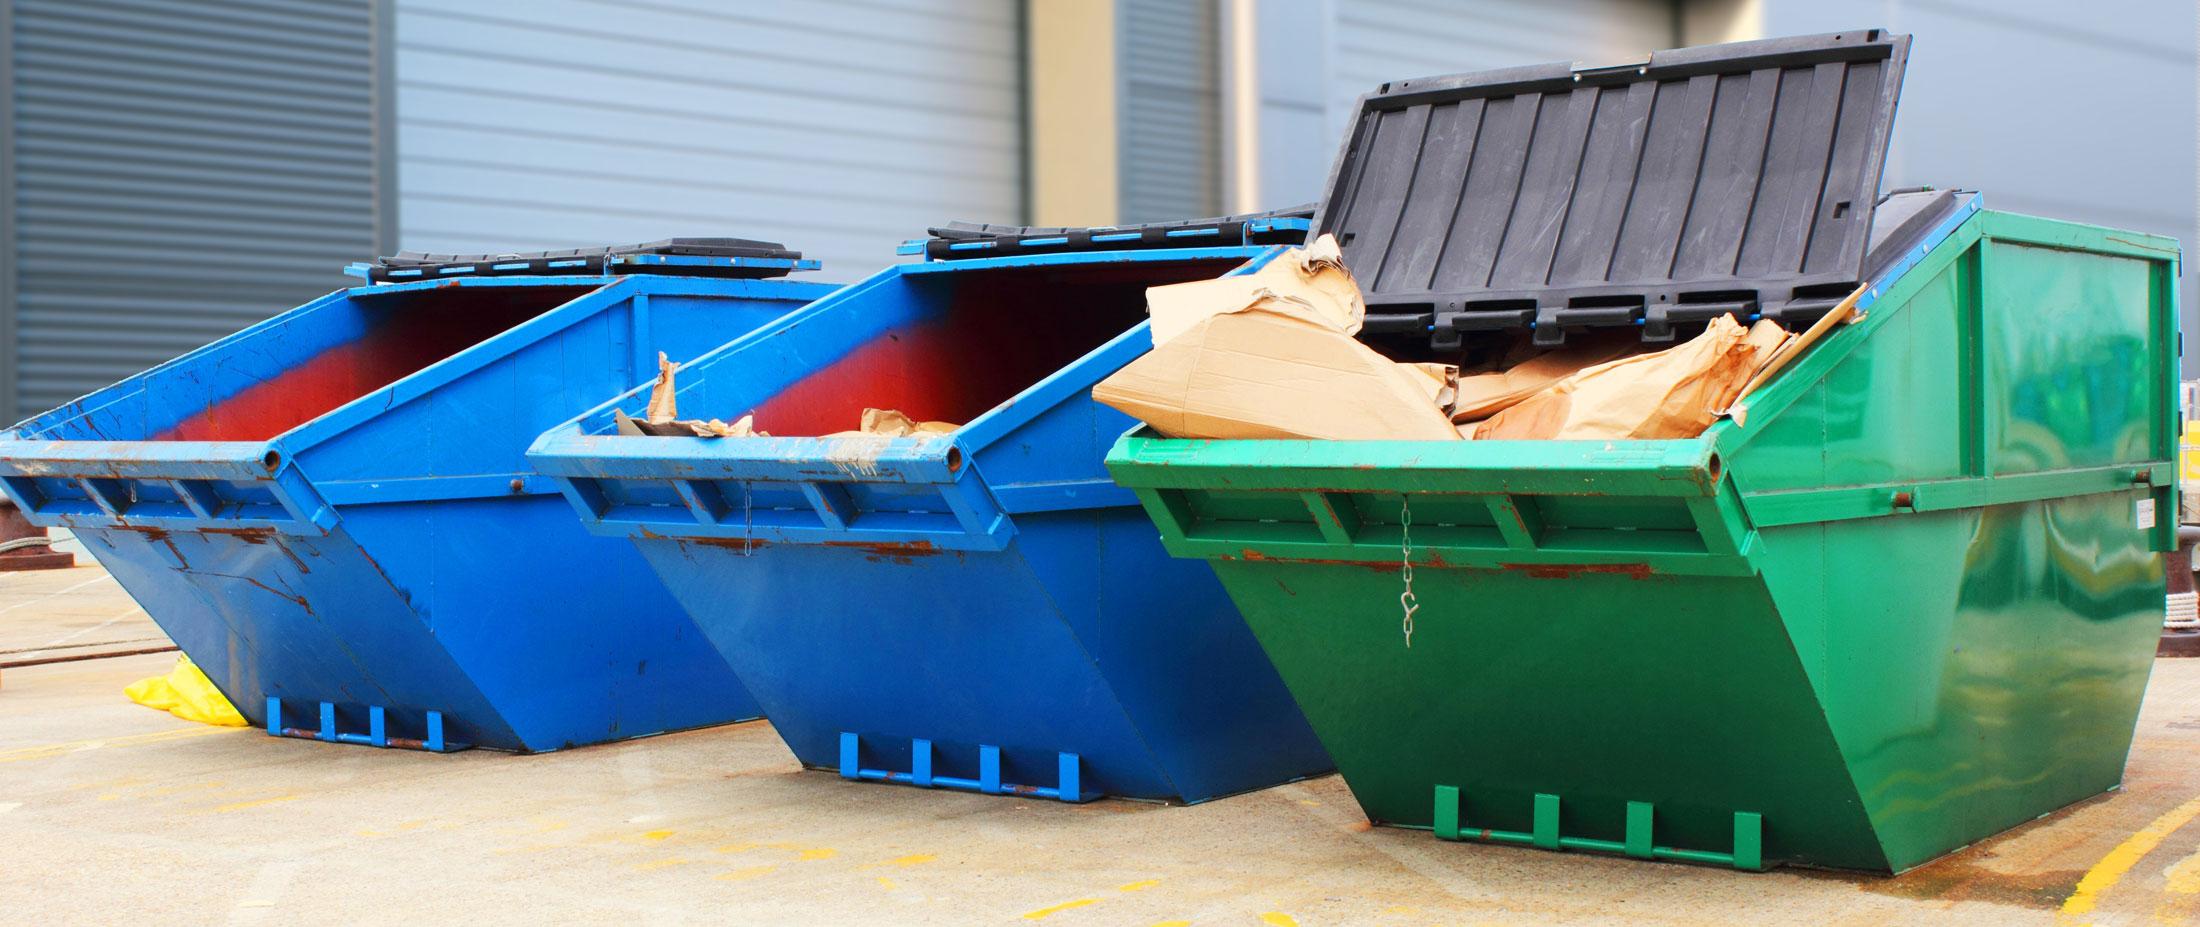 Consulenza gestione rifiuti - Kic Environmental Consulting